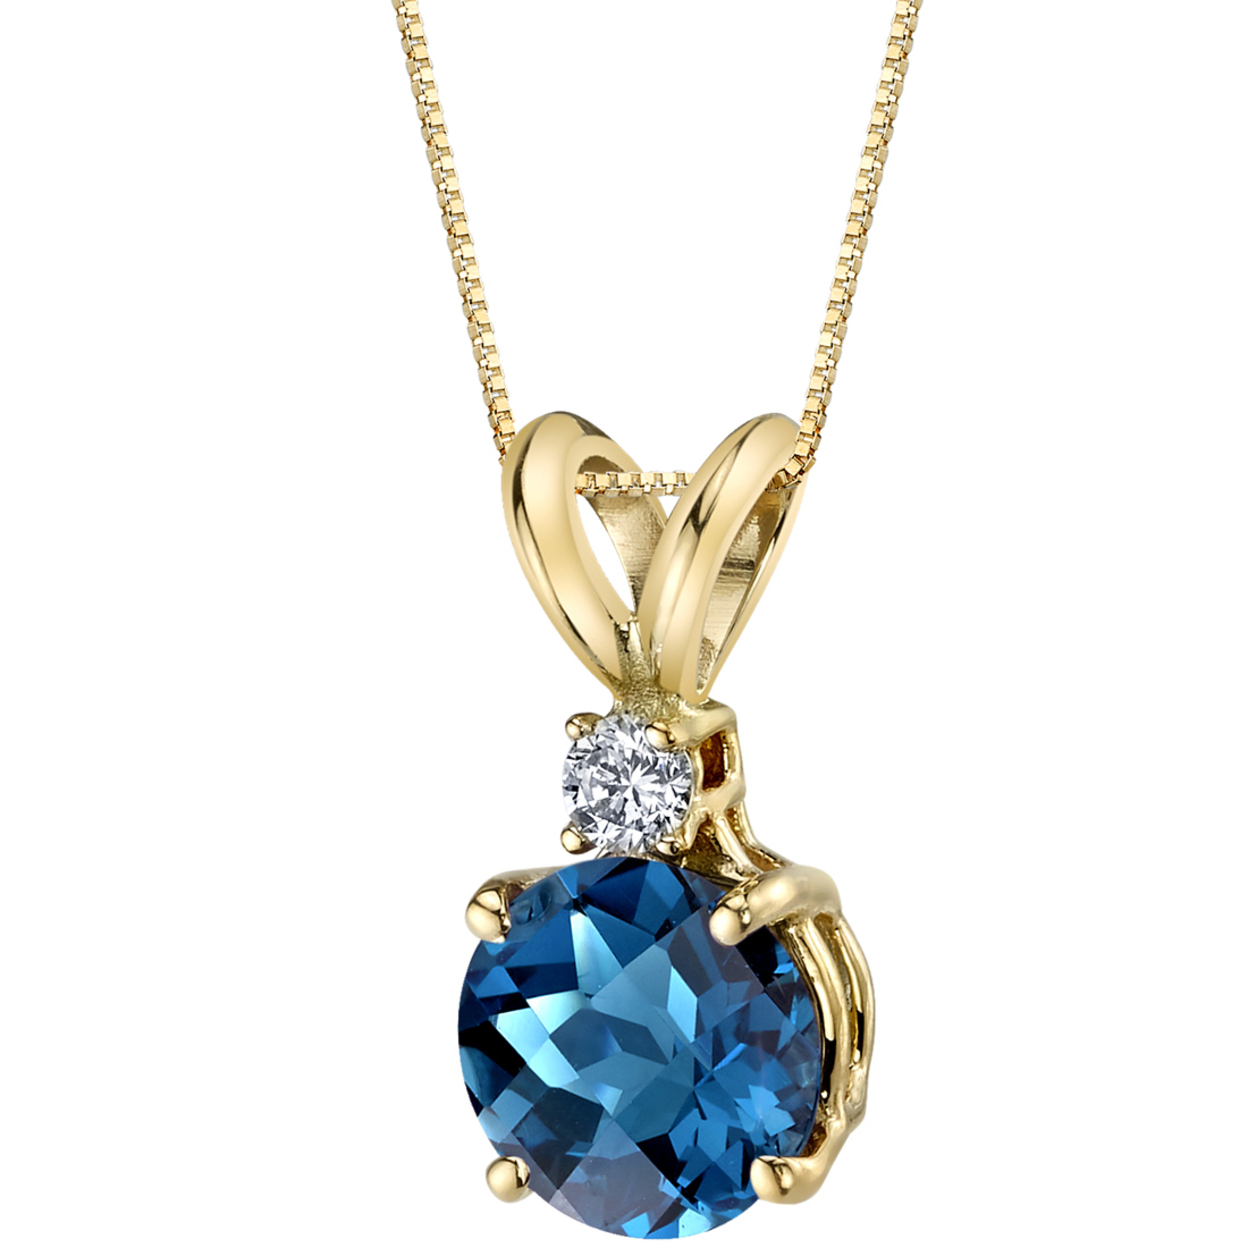 Oravo 14 Karat Yellow Gold Round Cut 1.25 Carats London Blue Topaz Diamond Pendant